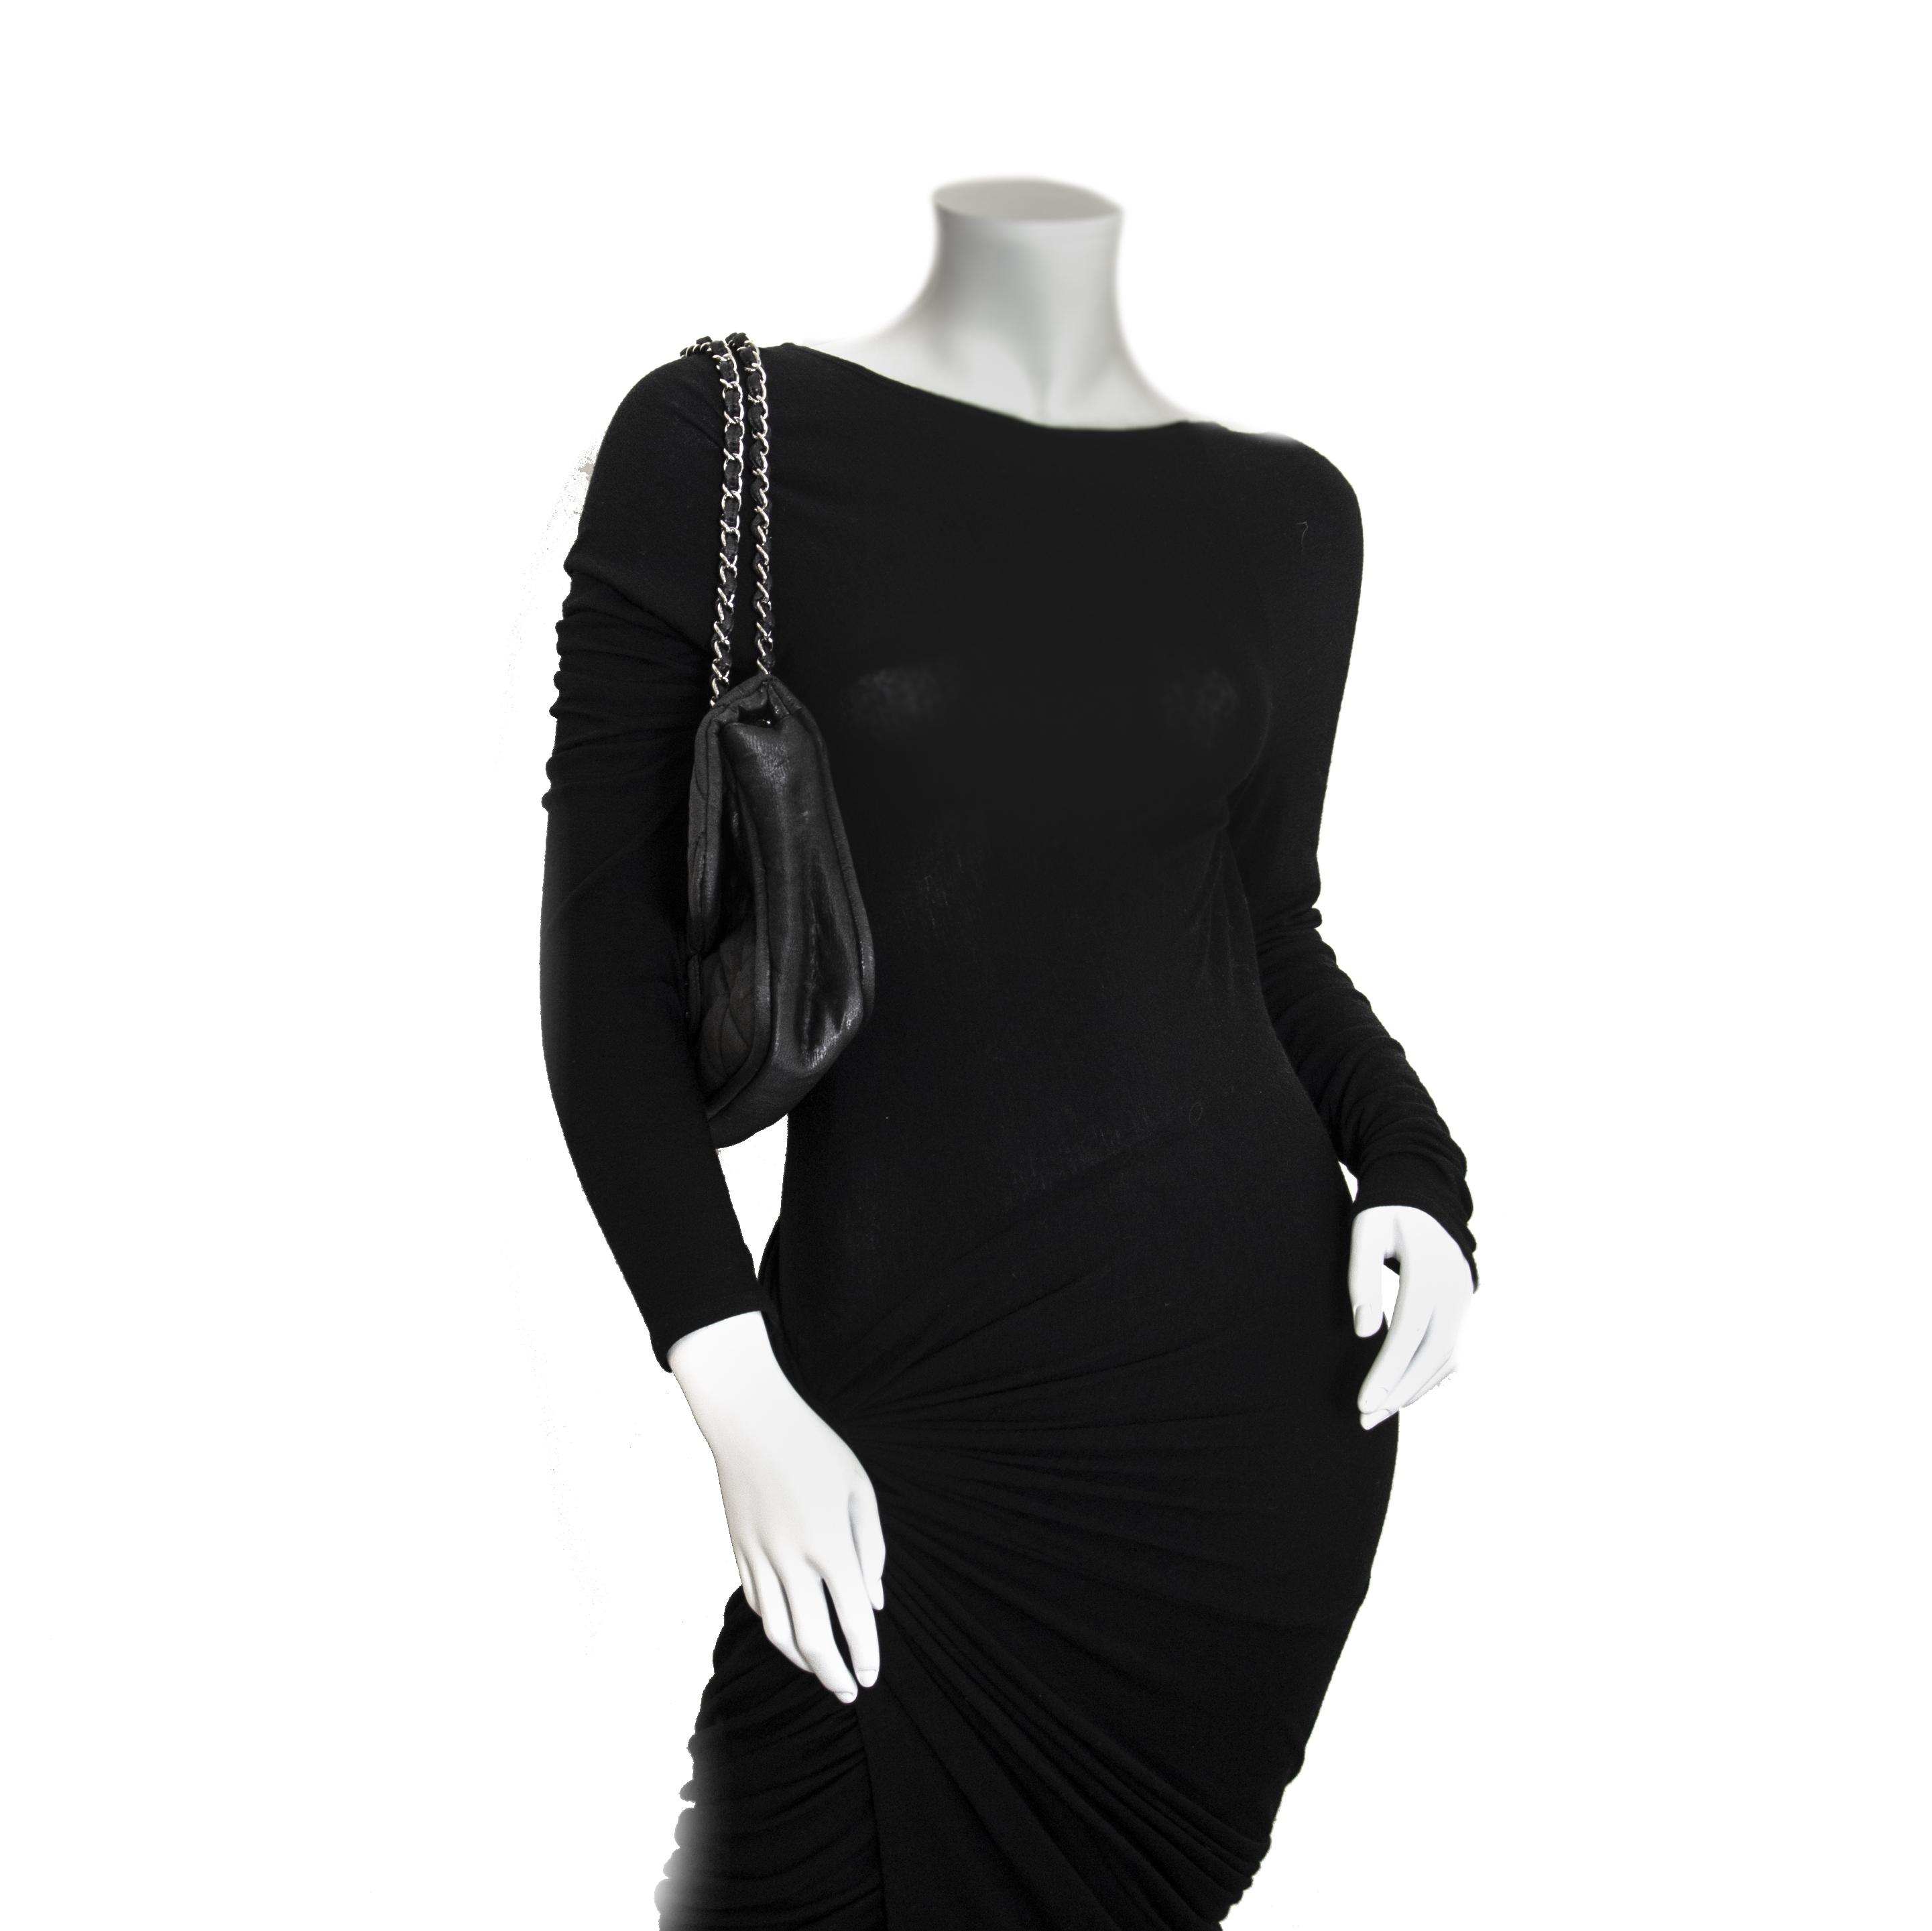 f8a4da2b0f4 ... Chanel Black Glitter Jersey Flap Bag now for sale at labellov vintage  fashion webshop belgium